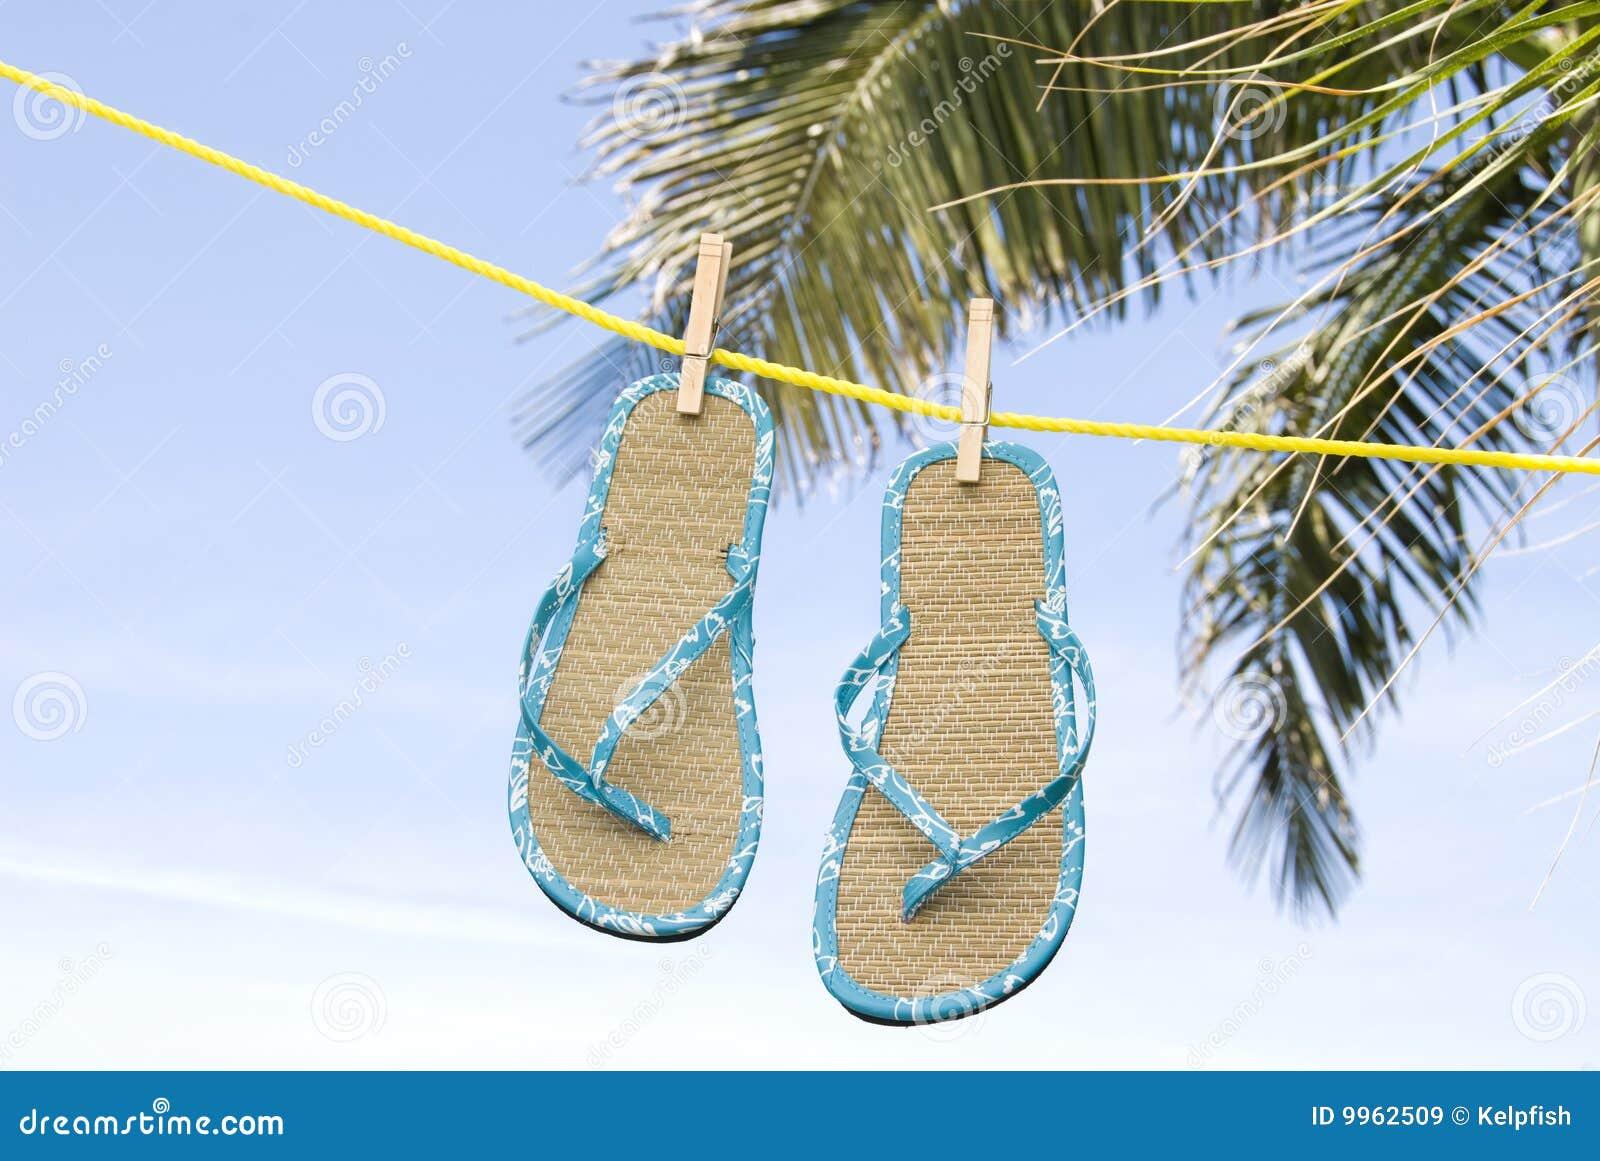 6bfe9d0046b972 Flip Flops Hanging On Clothesline Stock Image - Image of tropical ...